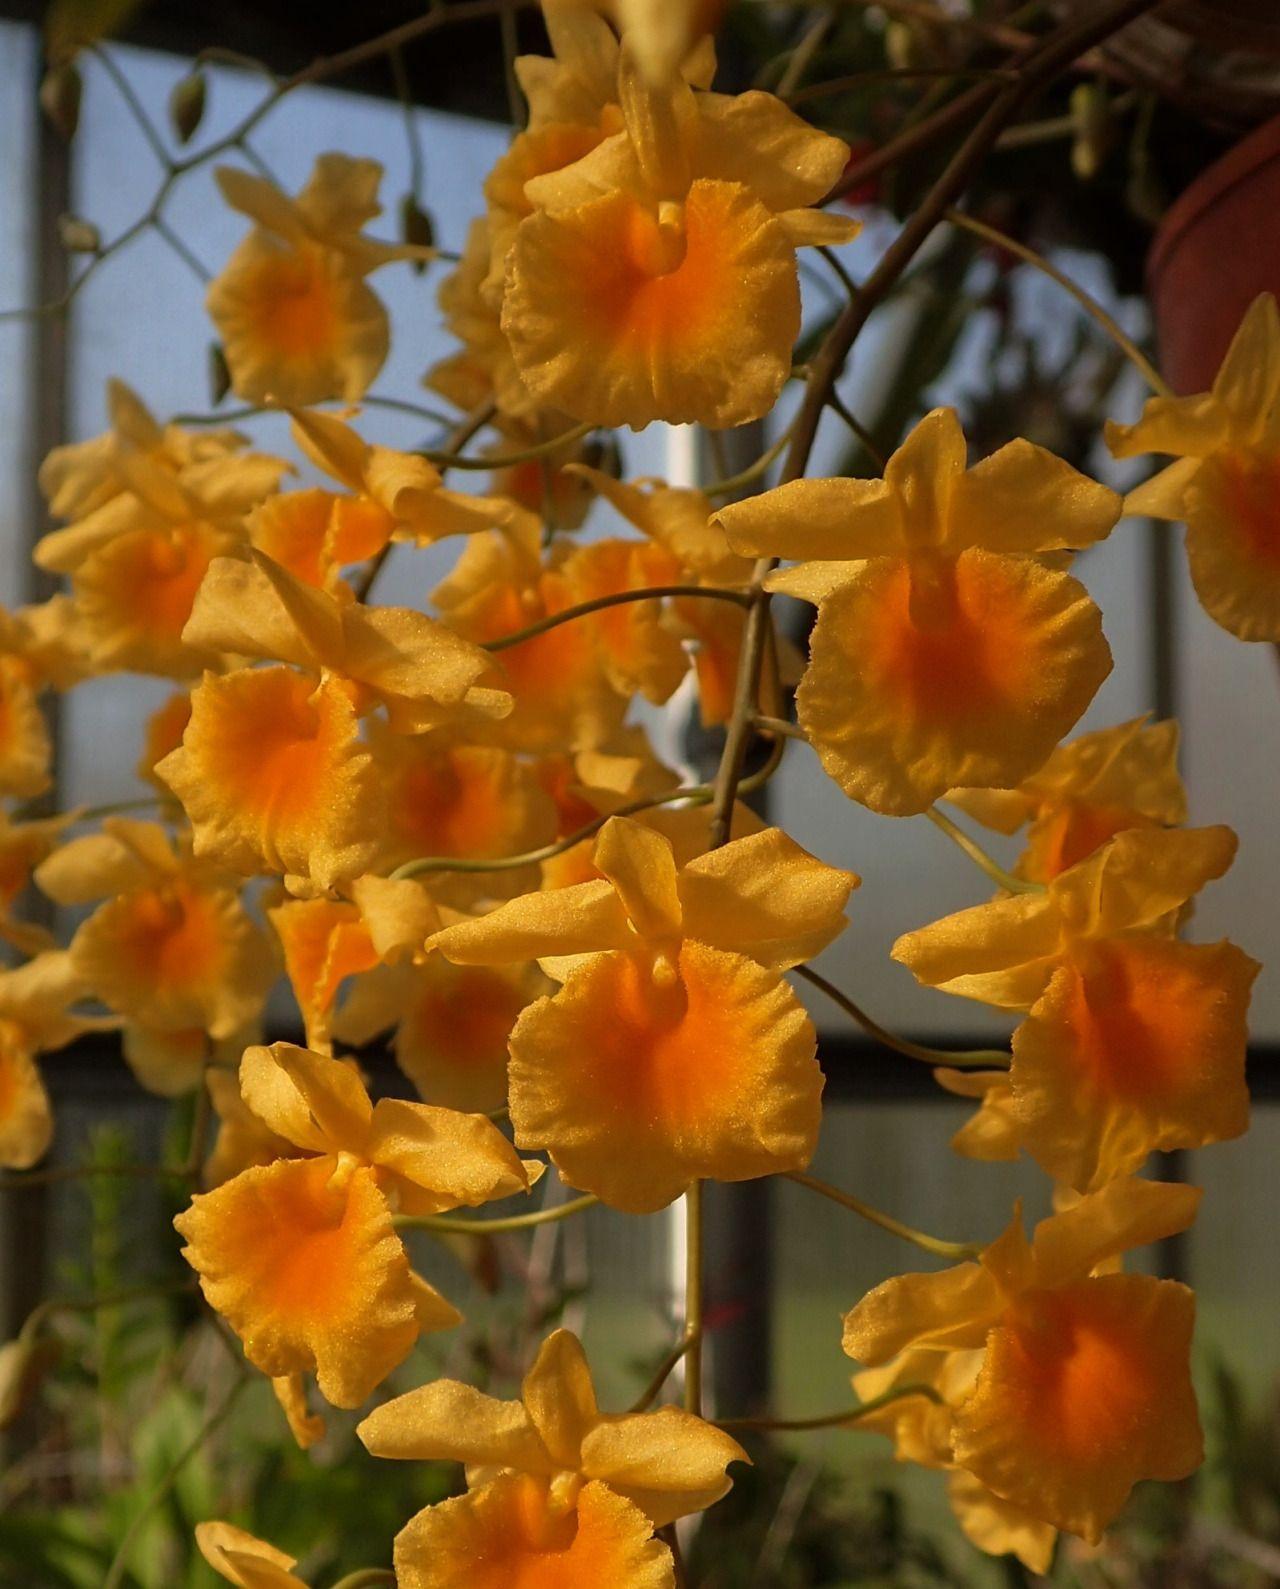 Dendrobium lindleyi Syn.: Dendrobium aggregatum; Callista aggregata; Epidendrum aggregatum; Dendrobium alboviride var. majus; Dendrobium lindleyi var. majus May 14, 2016